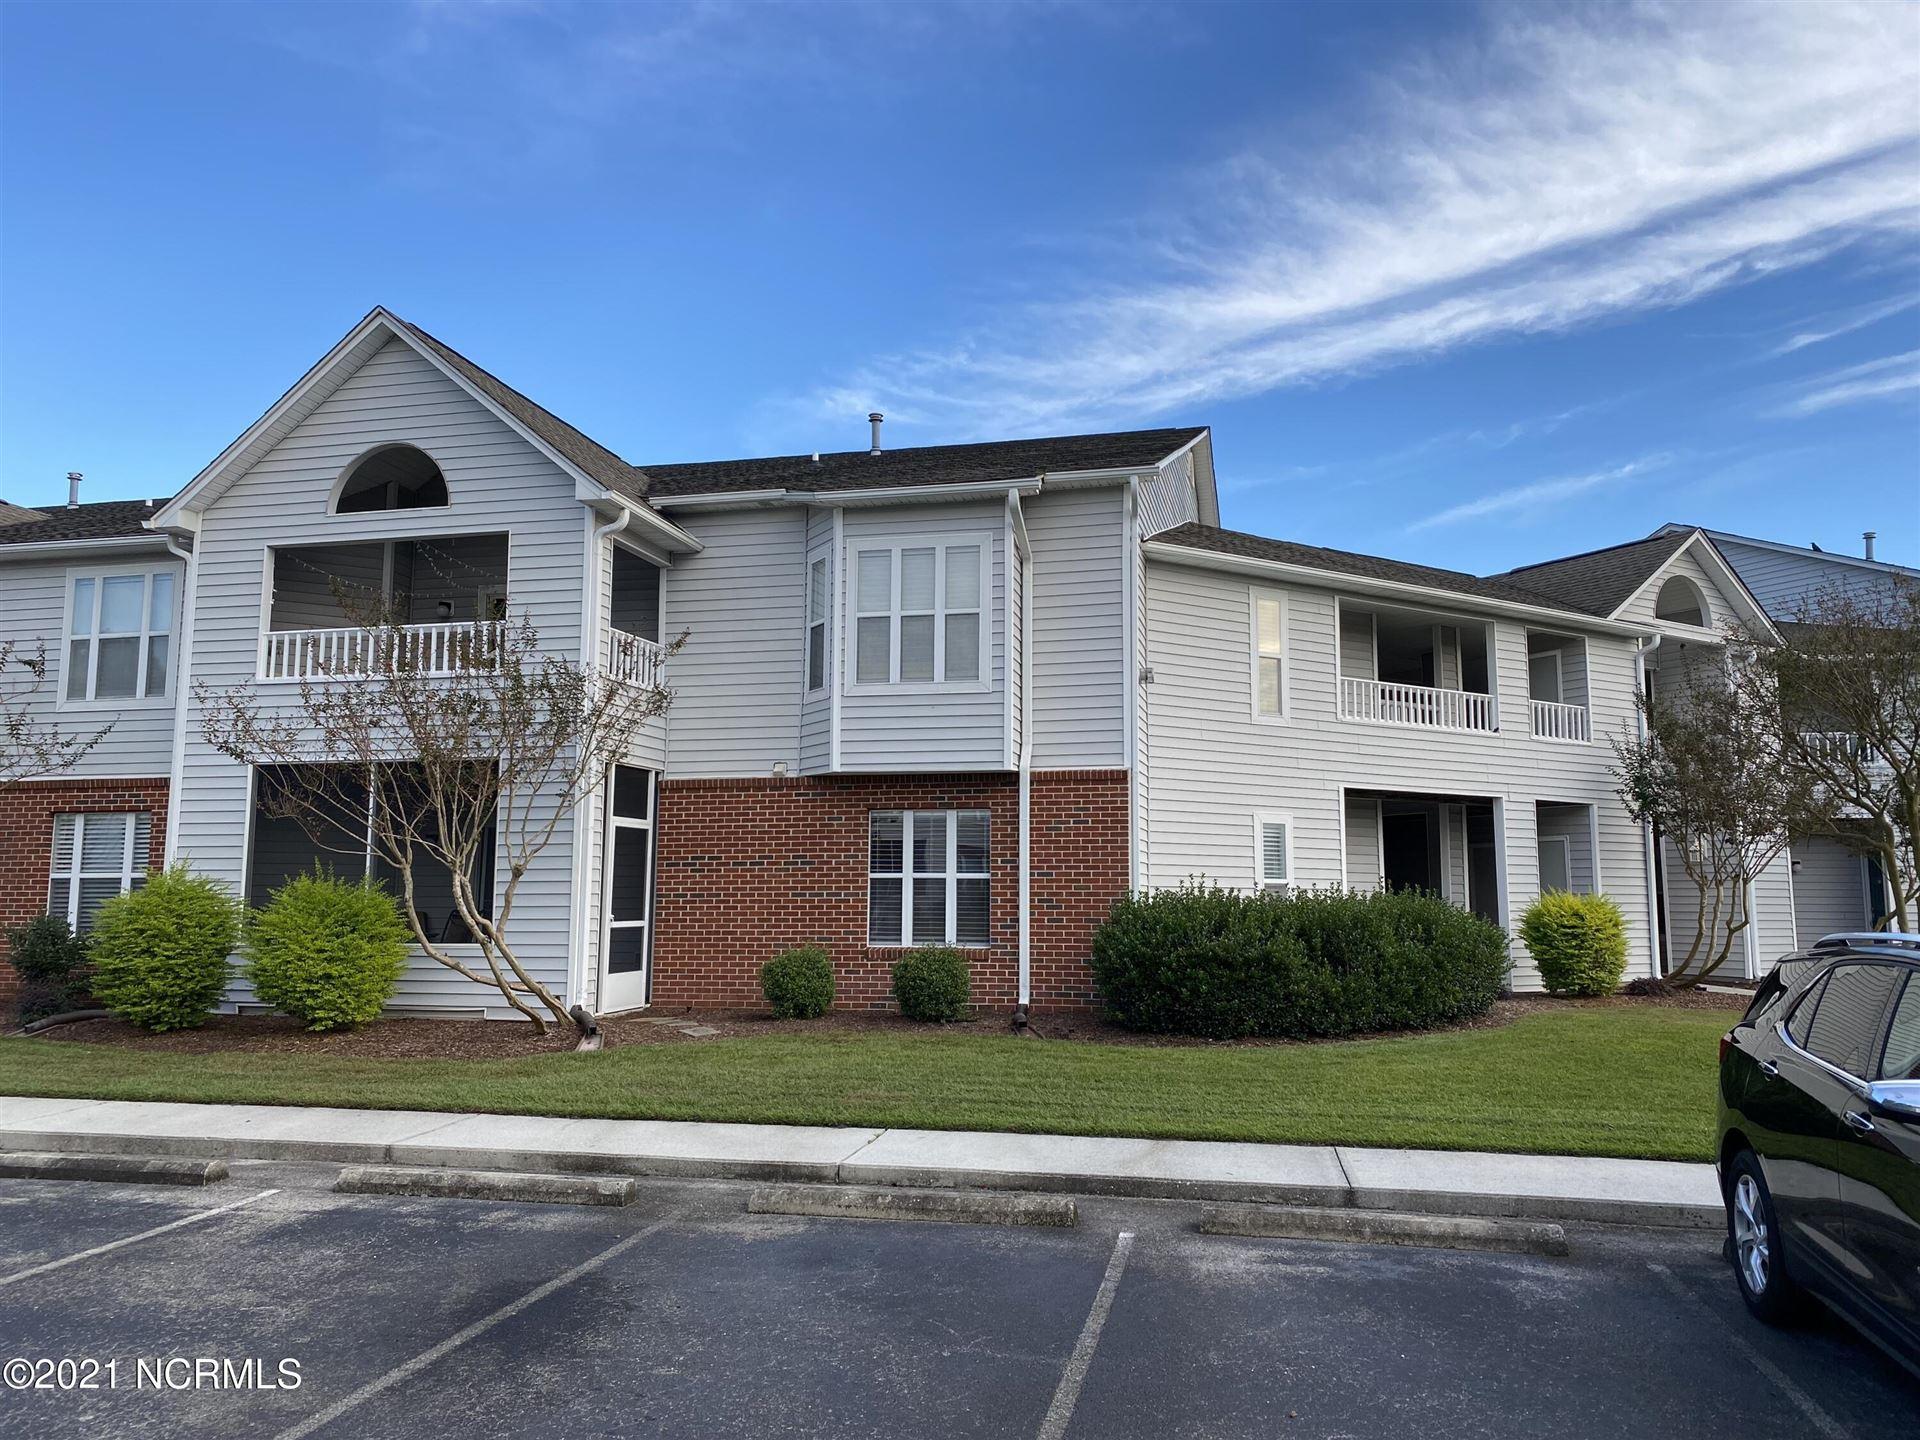 Photo of 4111 Breezewood Drive #201, Wilmington, NC 28412 (MLS # 100293697)